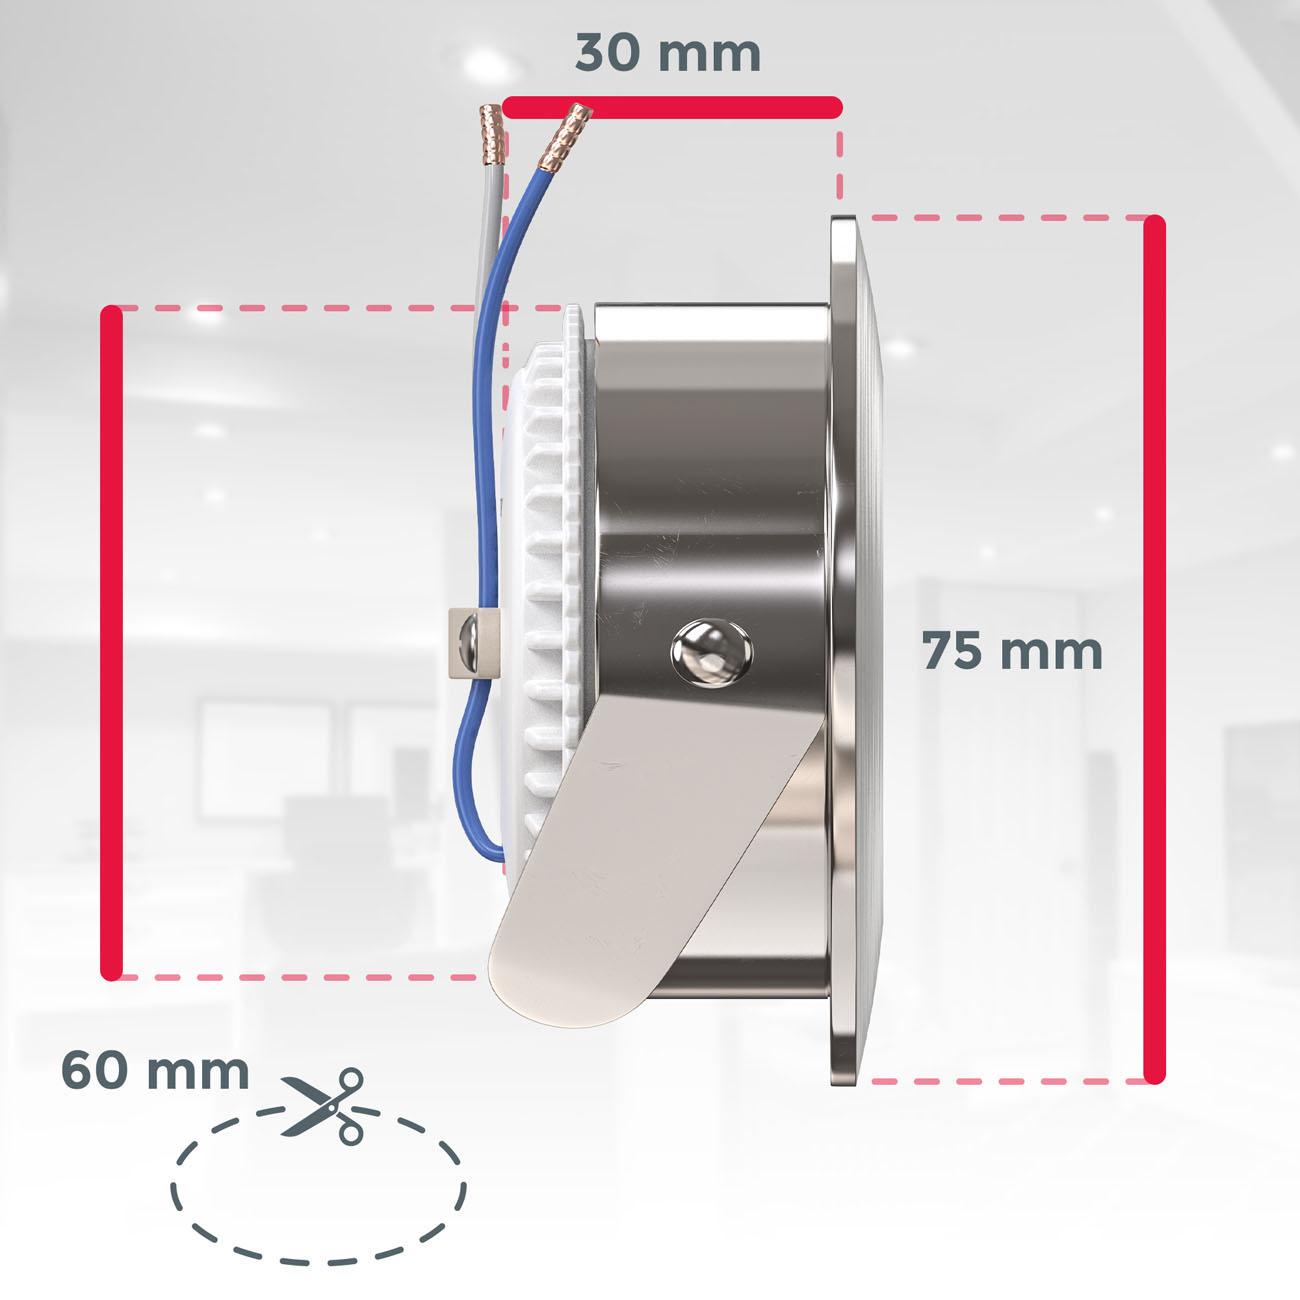 LED Einbaustrahler   Bad Einbauleuchte 5er SET   ultra flach 5W IP44 dimmbar - 7